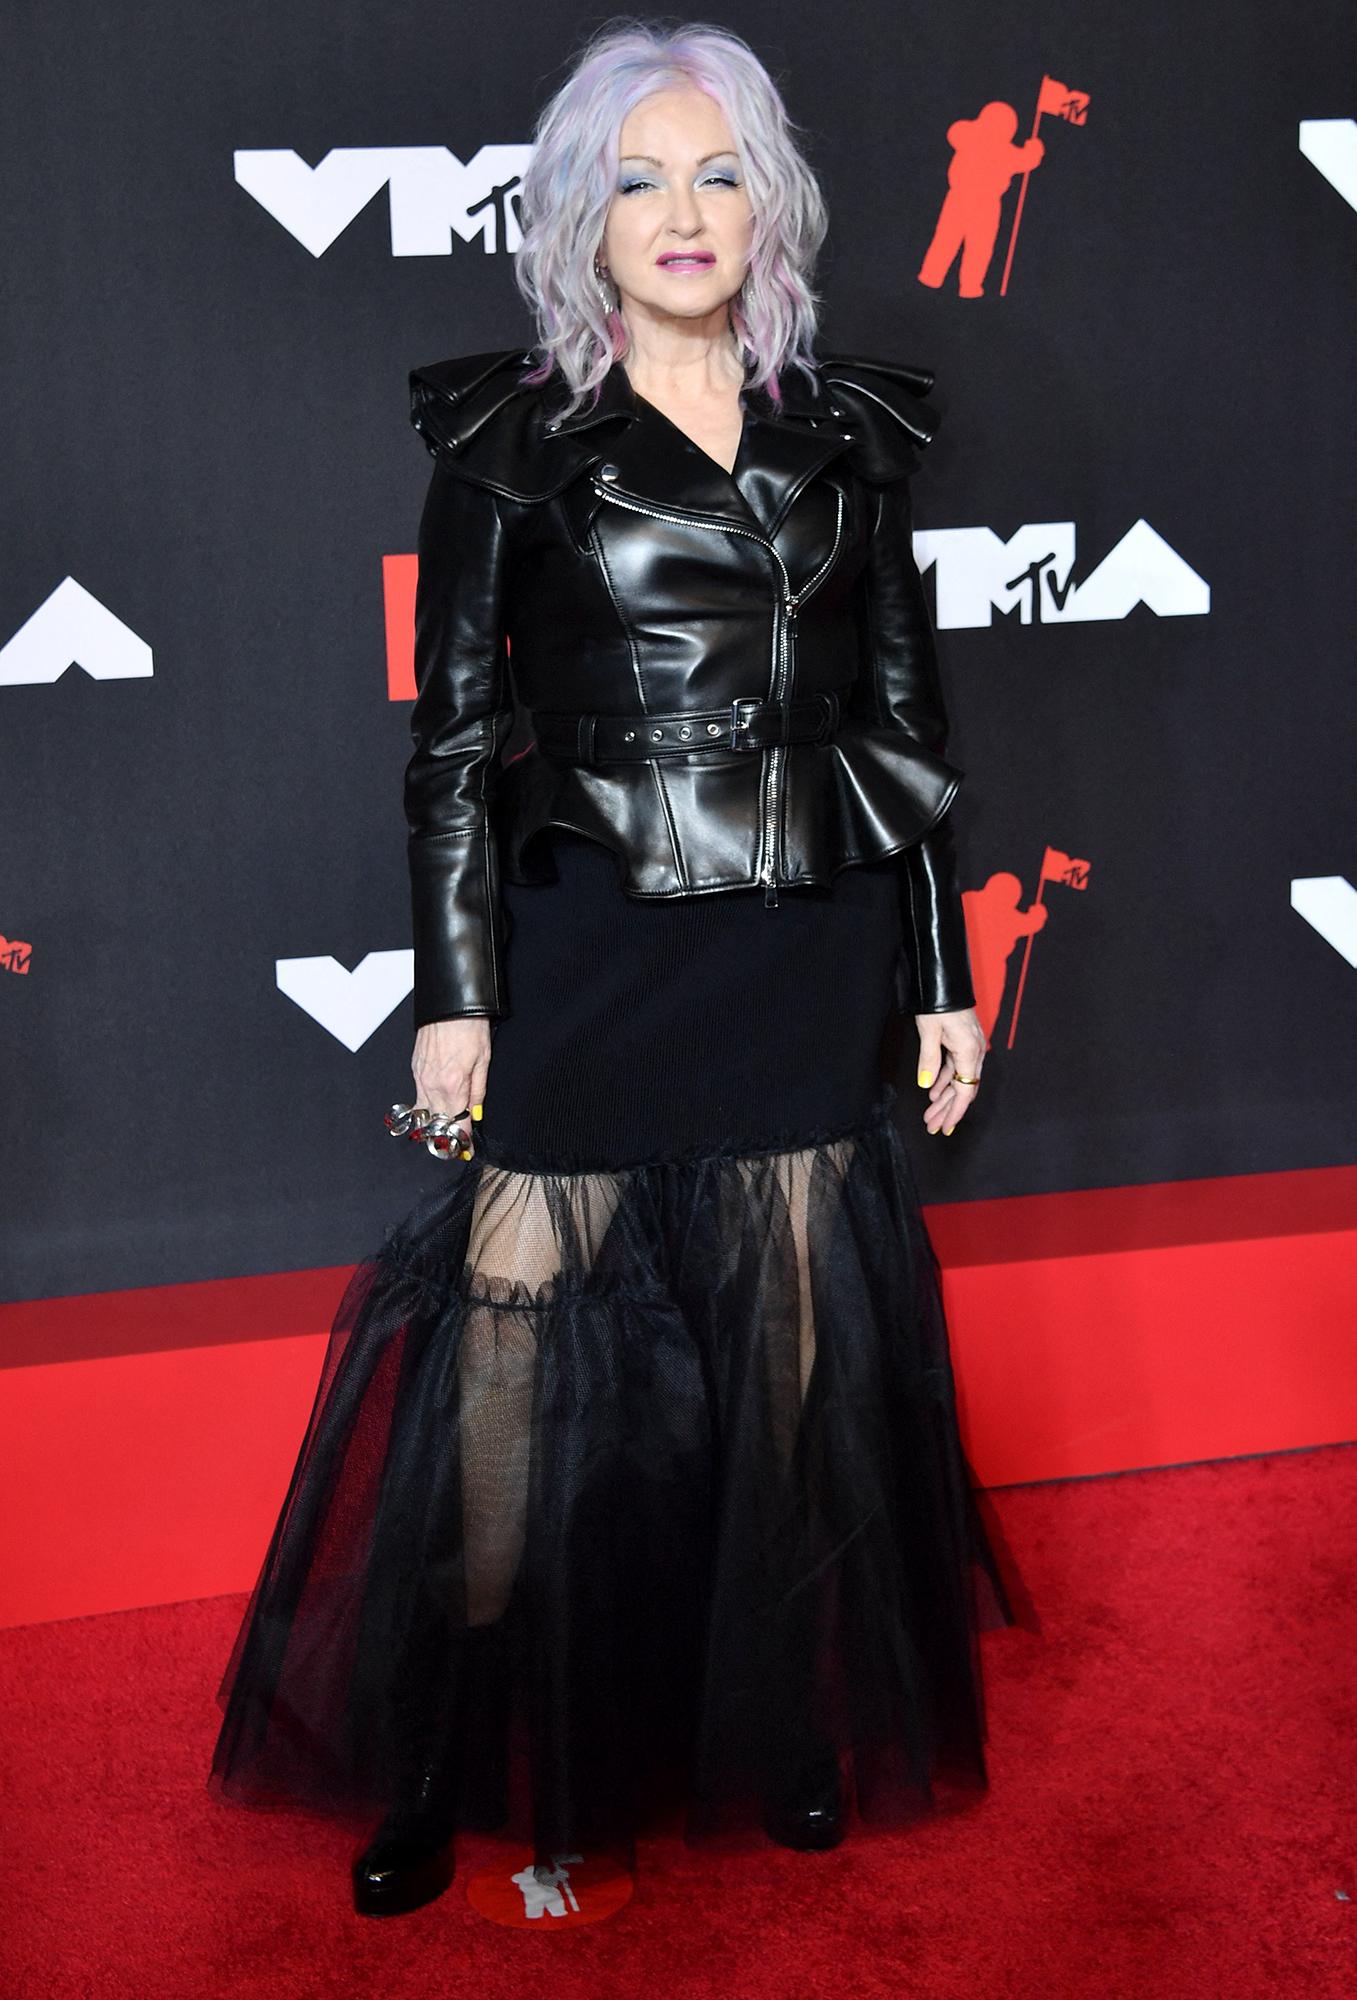 Cyndi Lauper arrives at the 2021 MTV Video Music Awards